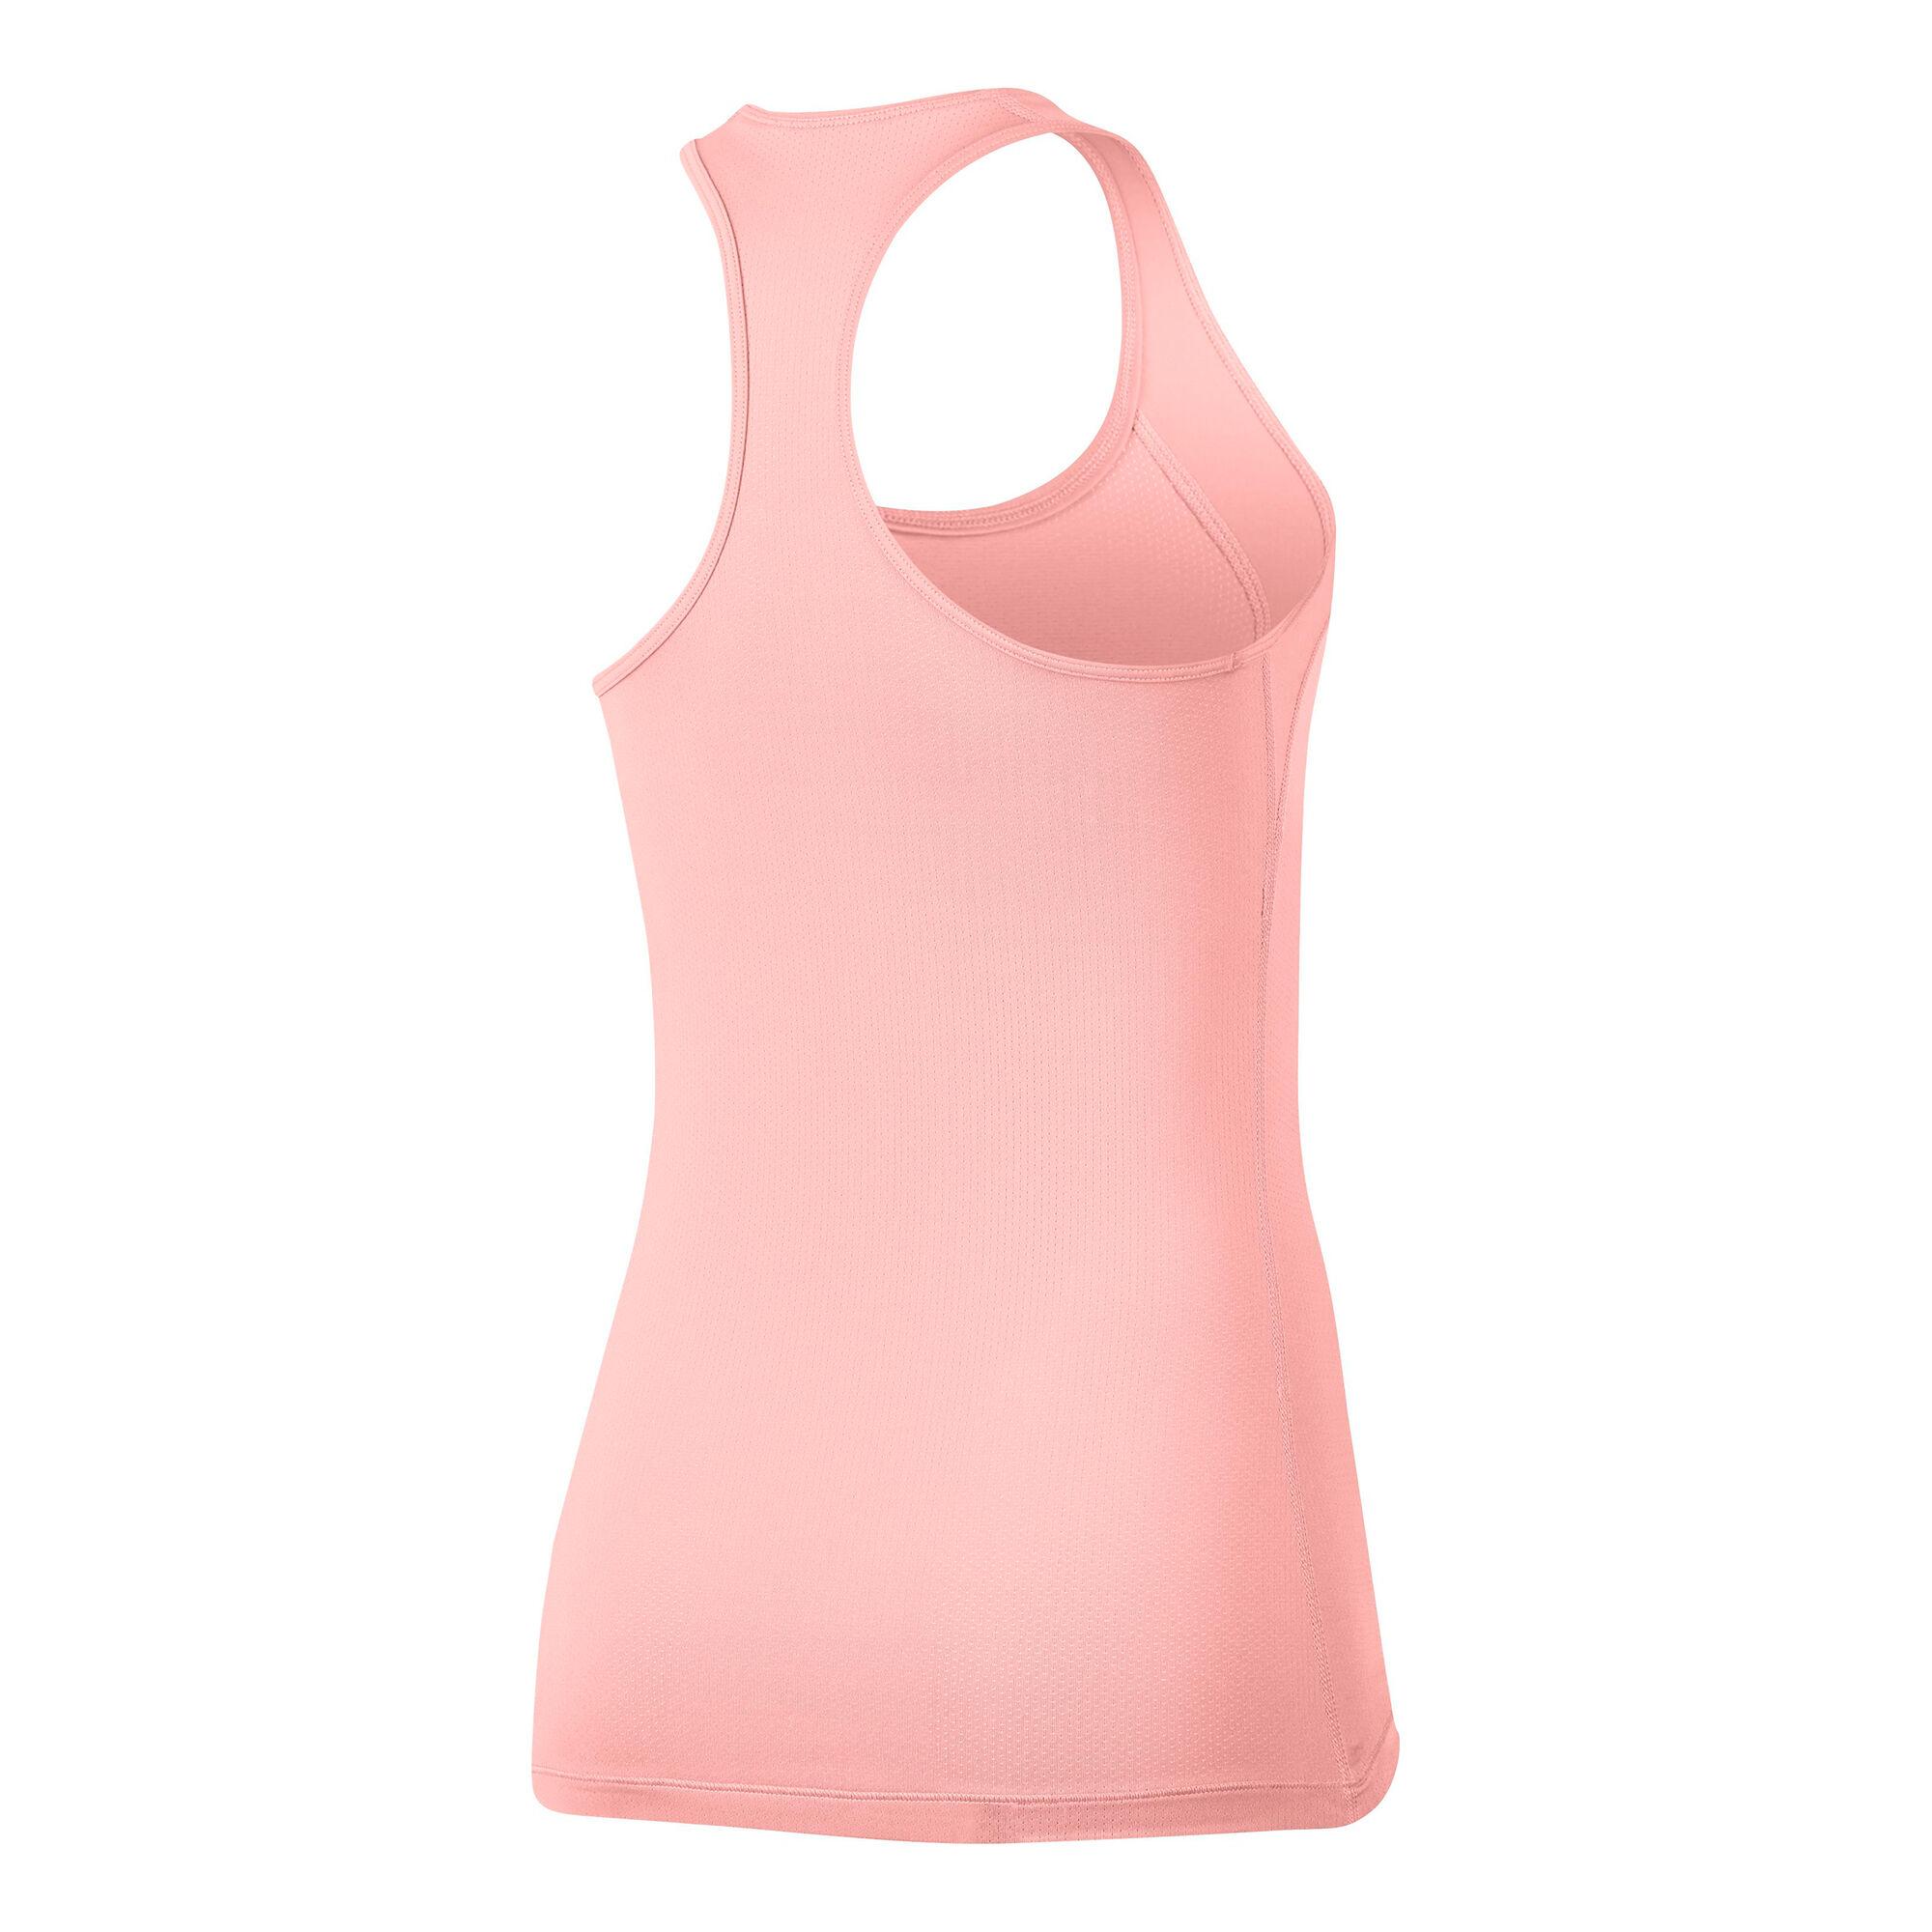 04ce1afdccb94 buy Nike Pro Tank Top Women - Pink